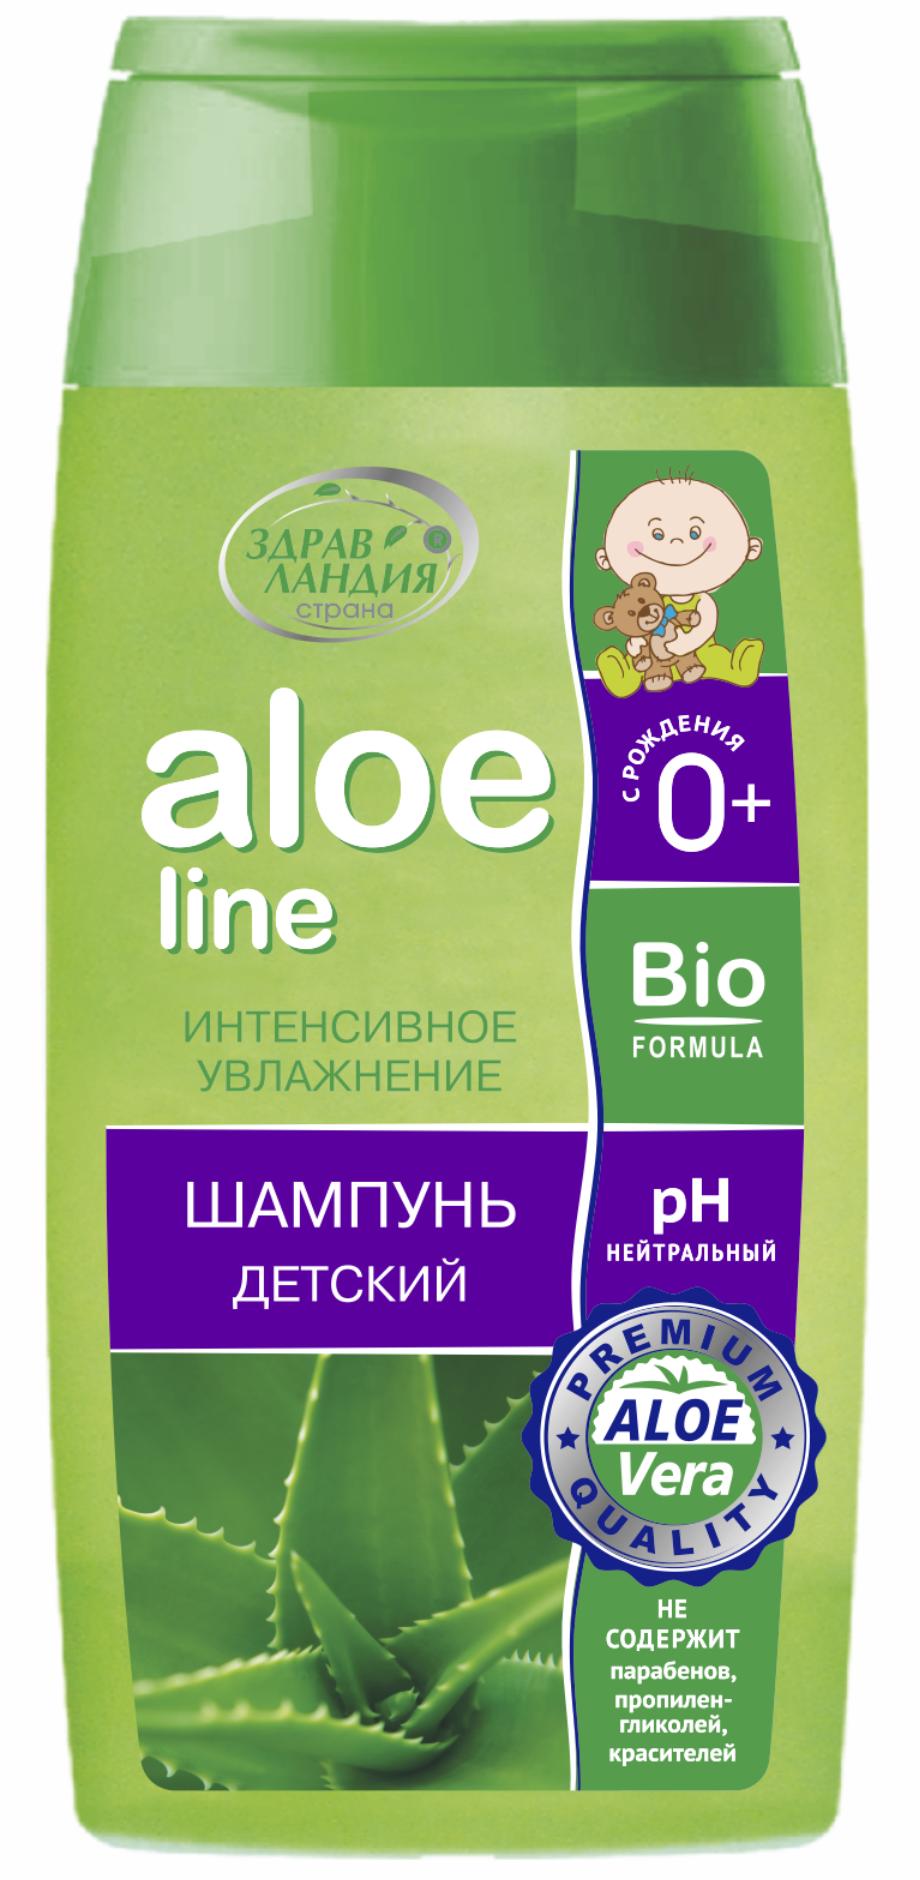 Aloe line детский шампунь 200 мл.